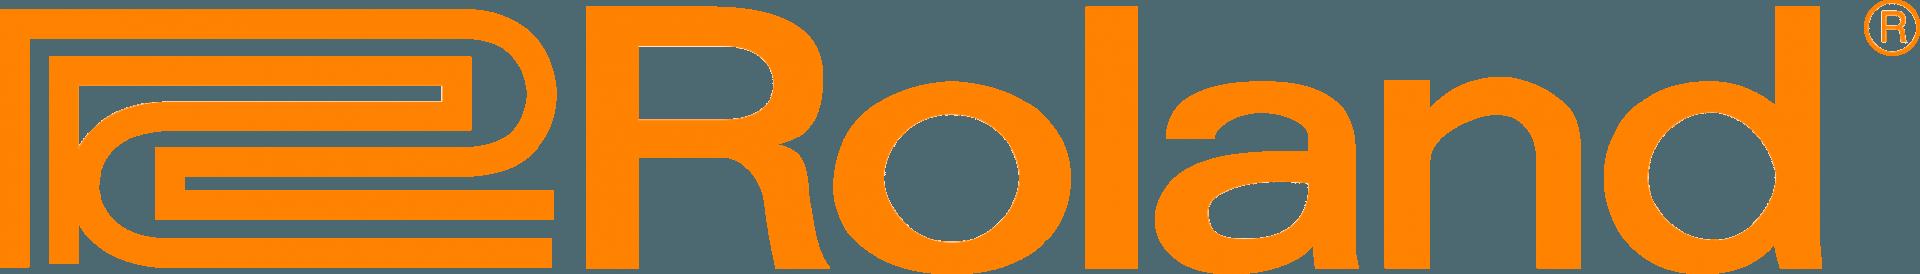 Roland logo orange